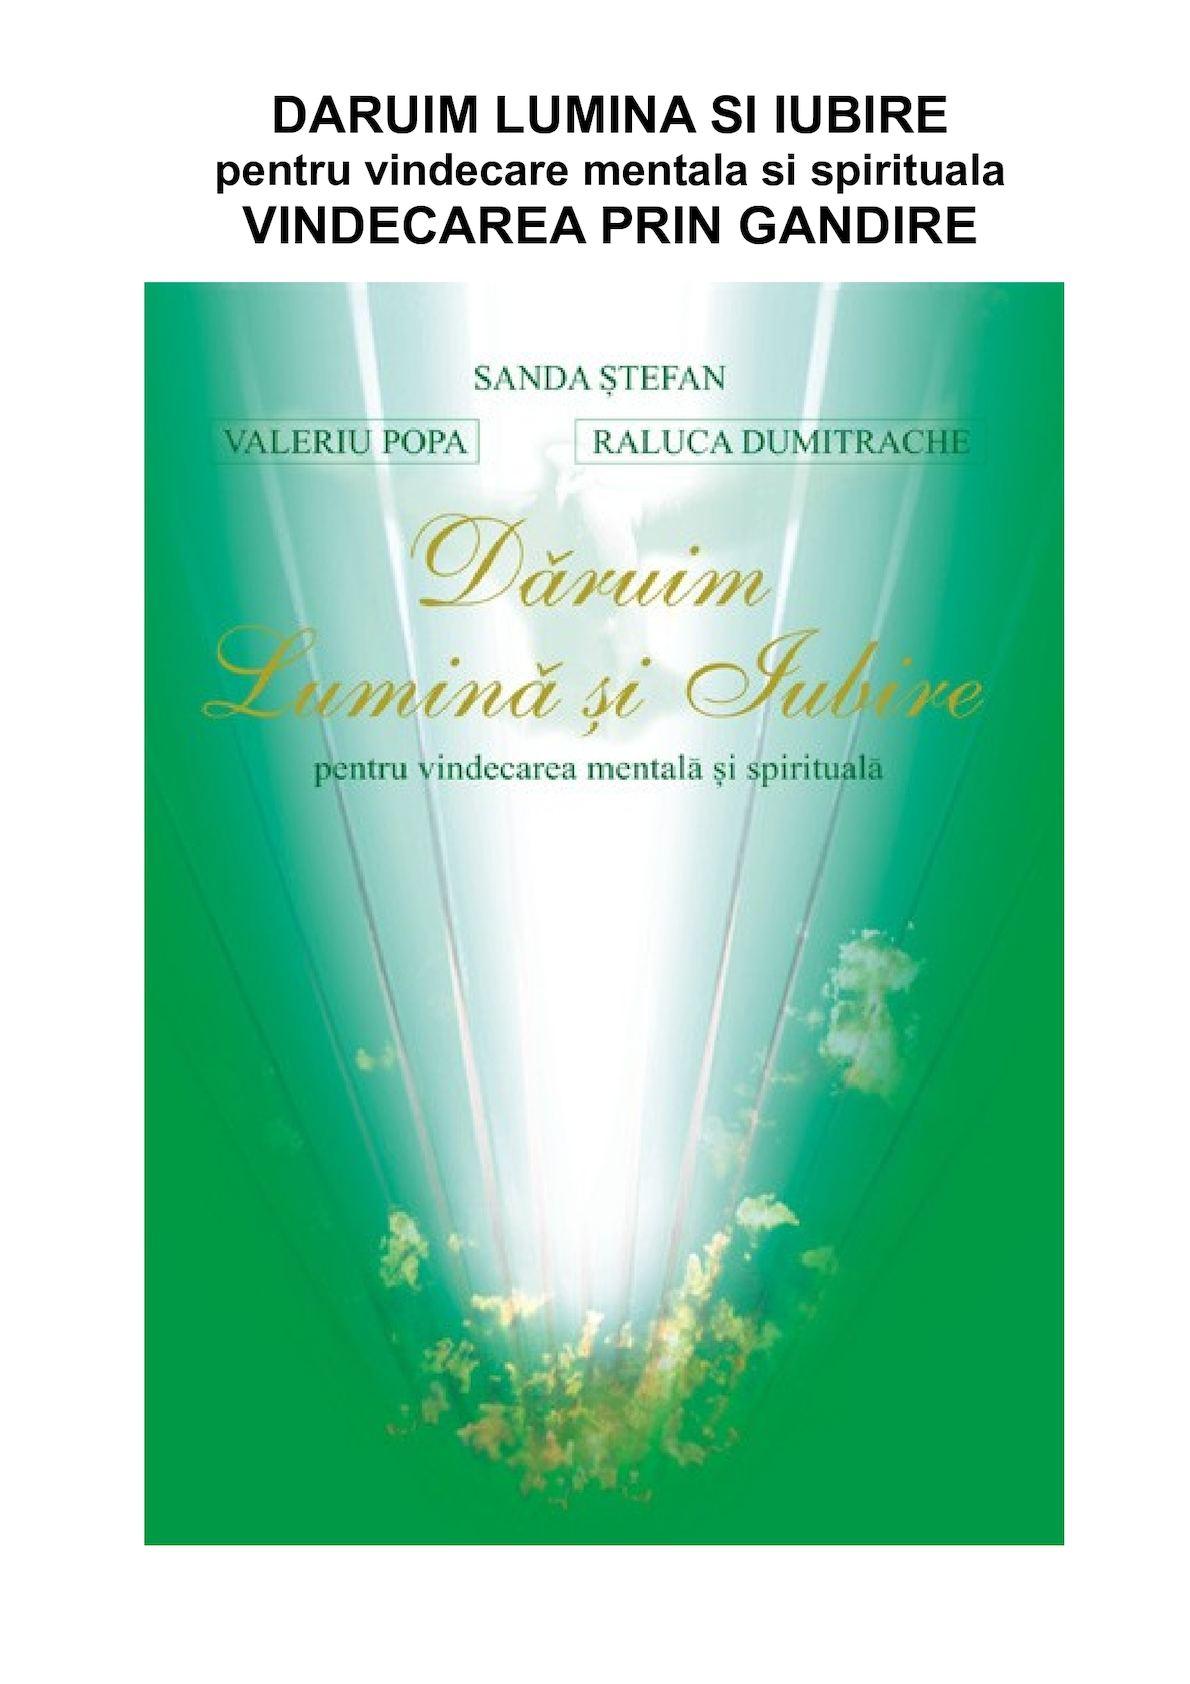 cancer ovarian cauze spirituale